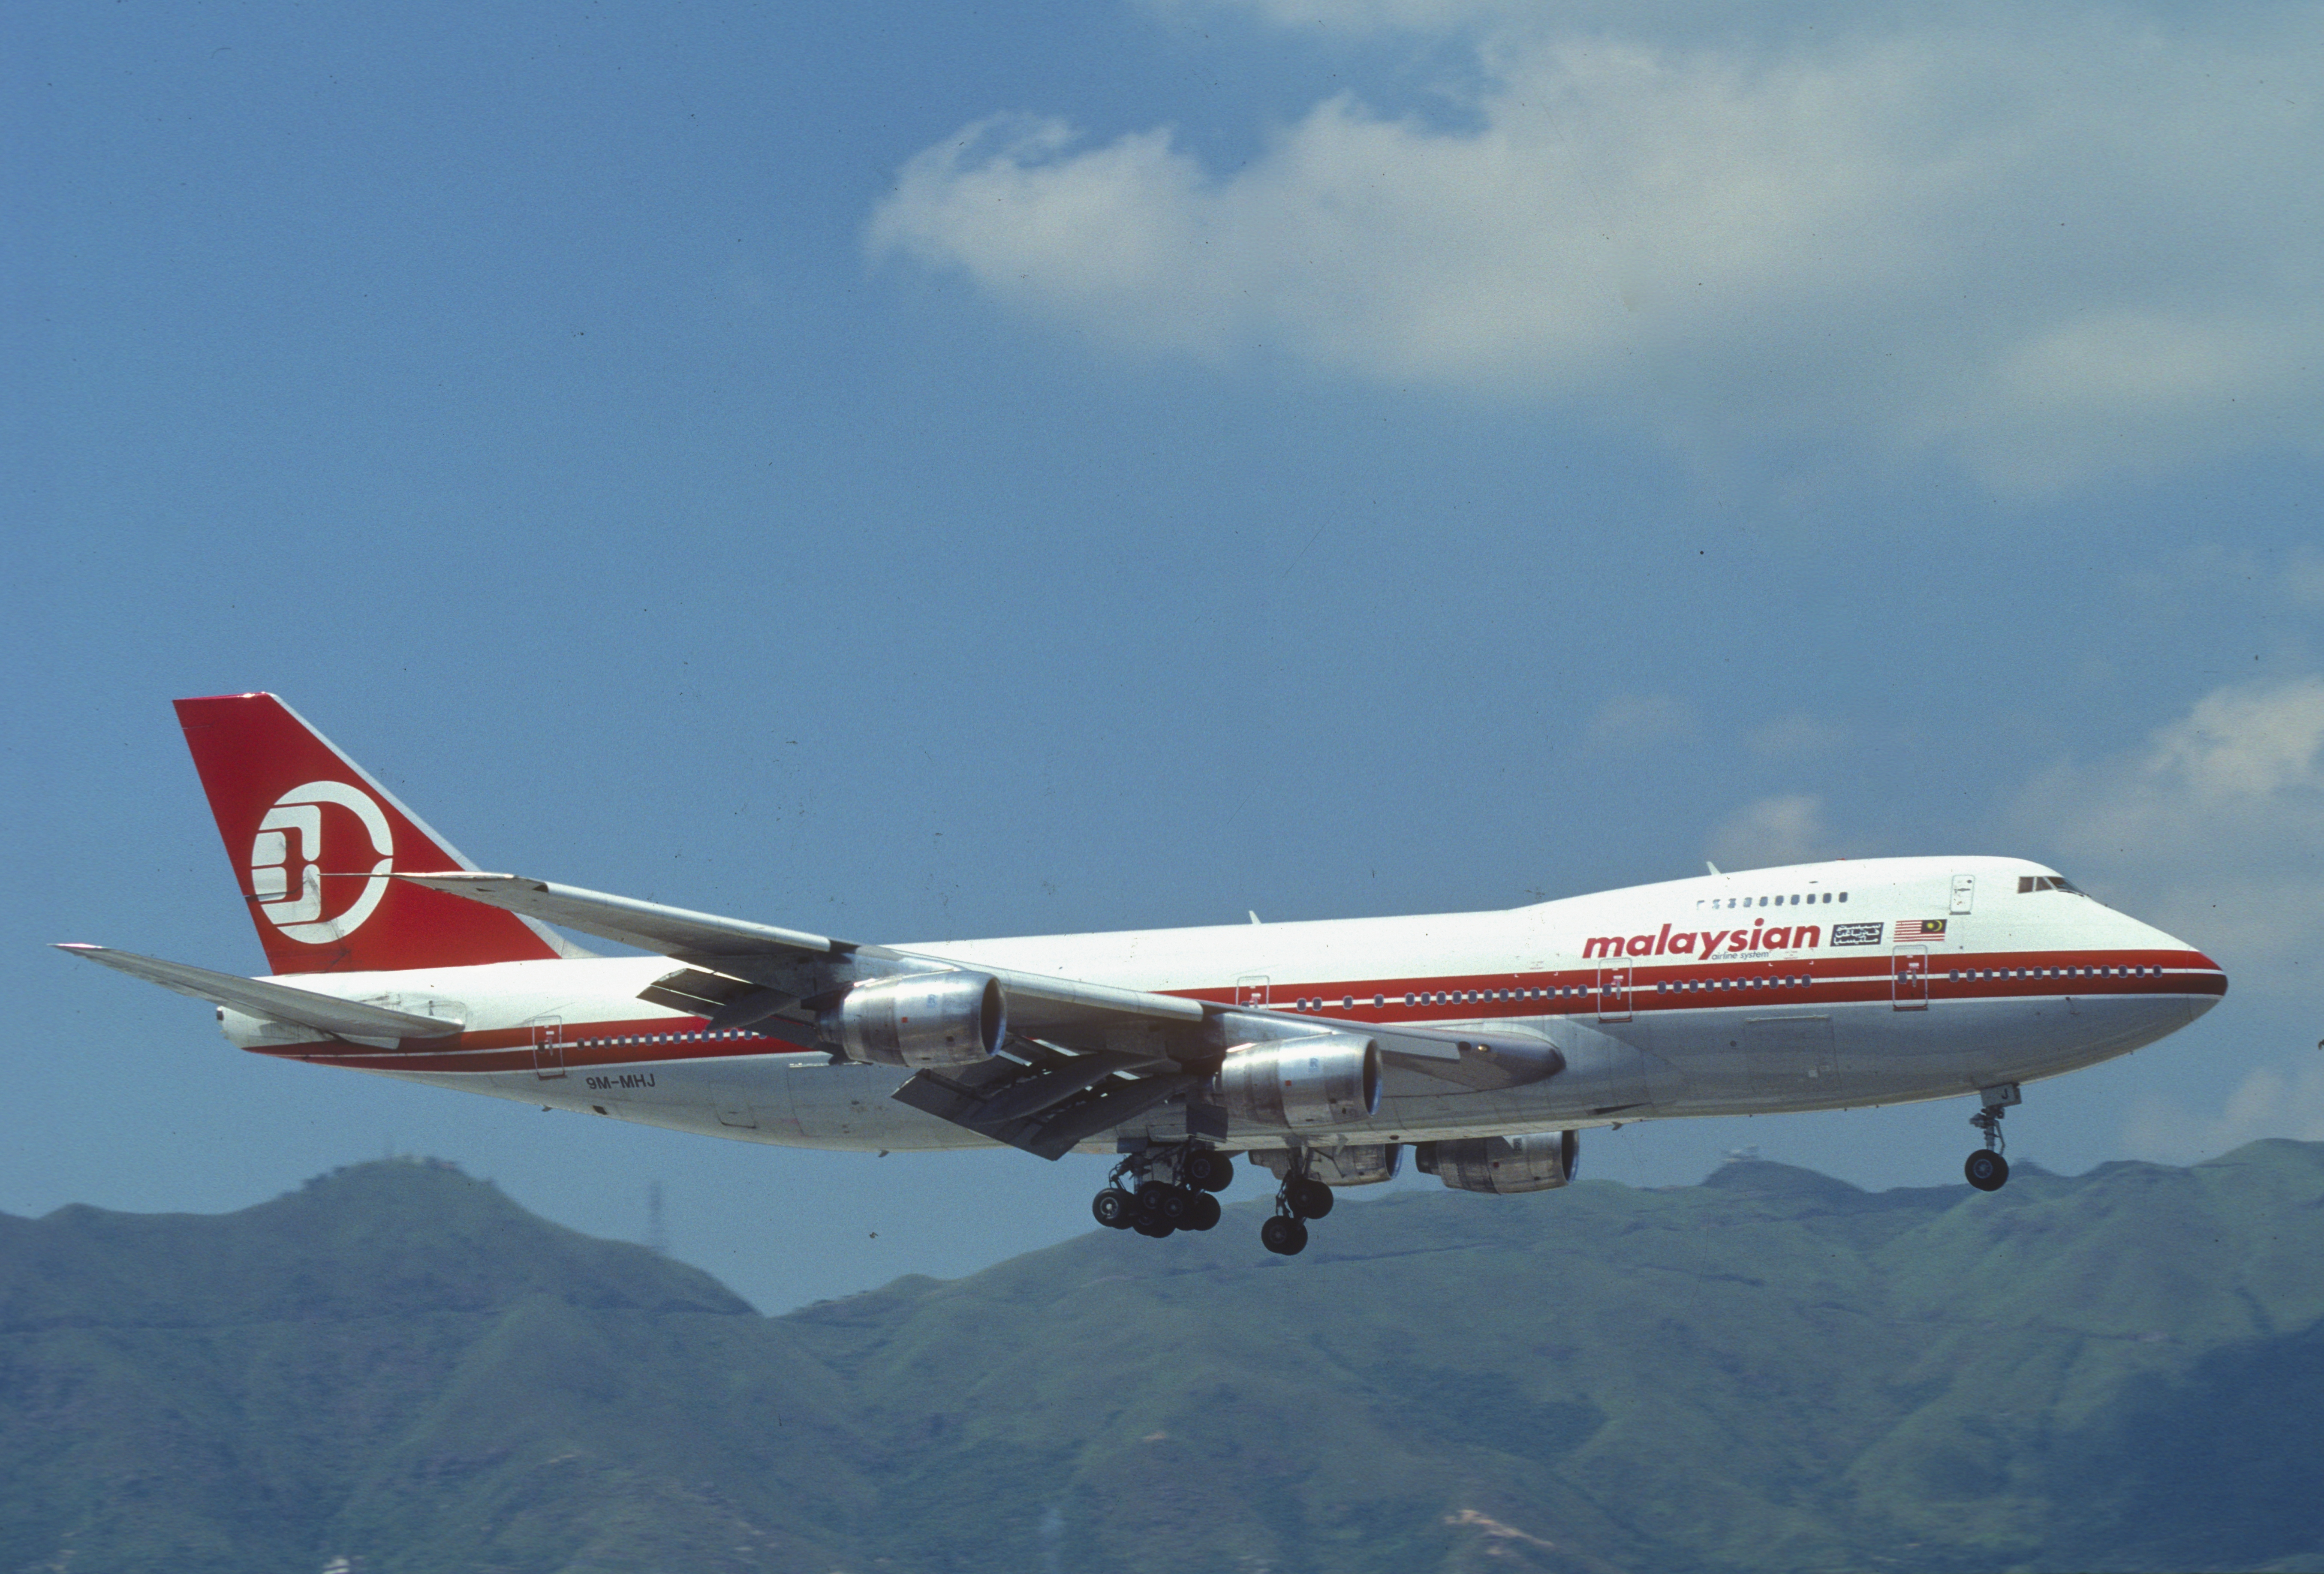 http://upload.wikimedia.org/wikipedia/commons/3/3c/Malaysia_Airlines_Boeing_747-236B%3B_9M-MHI,_June_1988_(5647222547).jpg